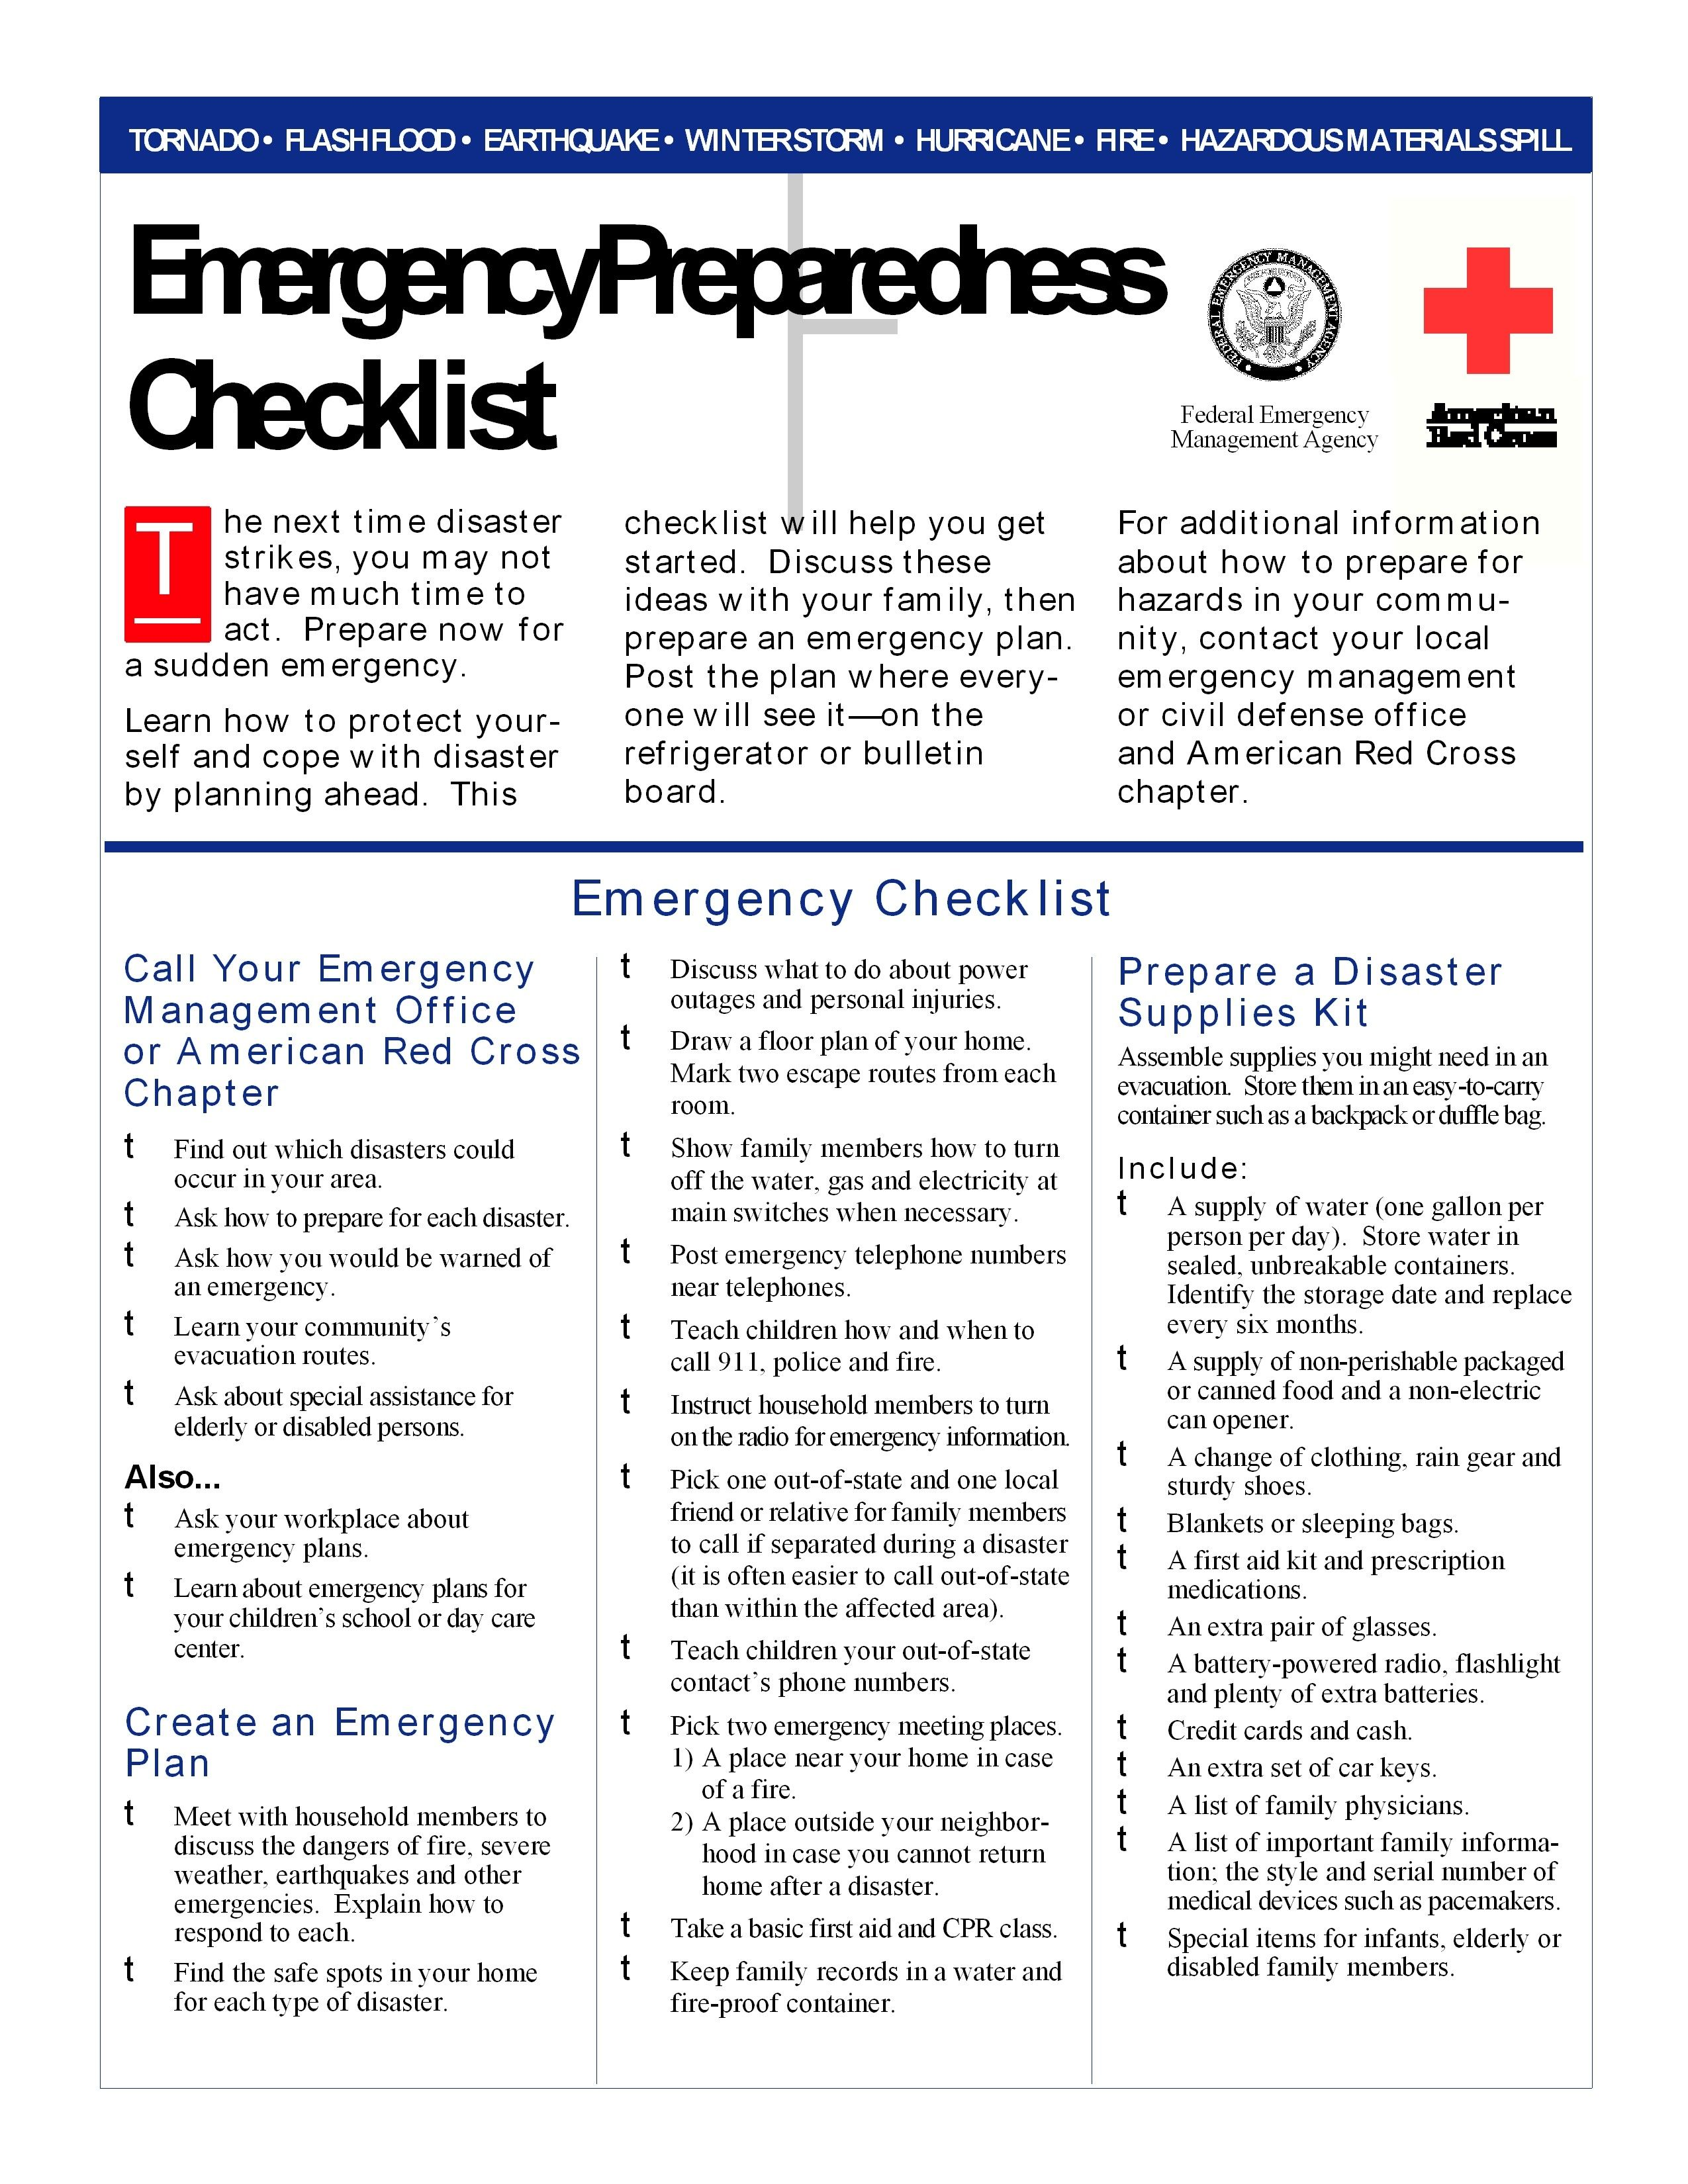 PS Emergency Preparedness Checklist (1) Emergency